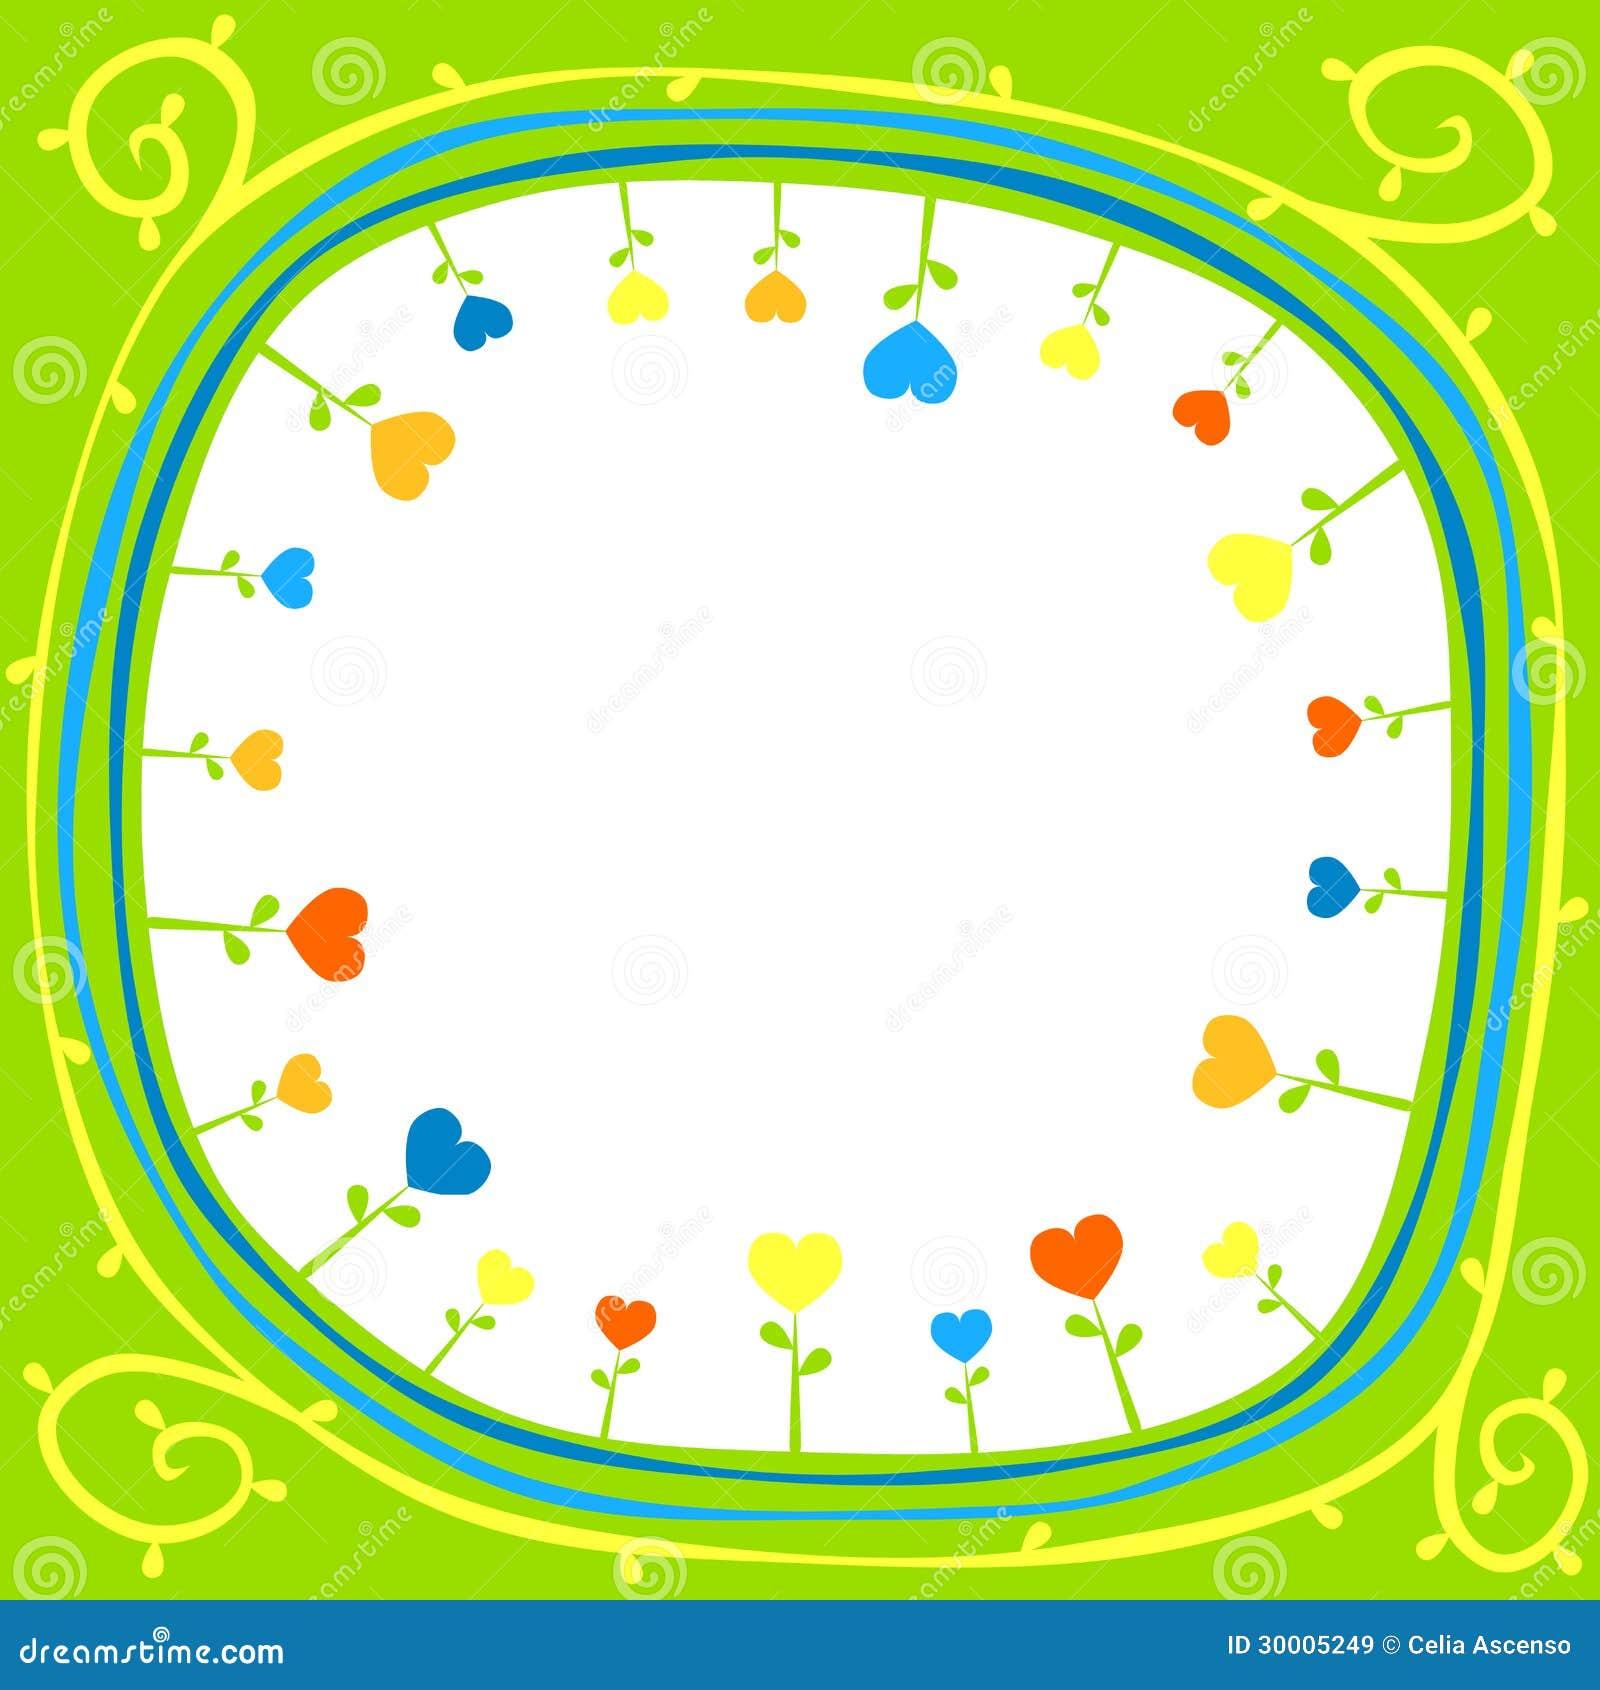 Borders For Invitation with adorable invitations template